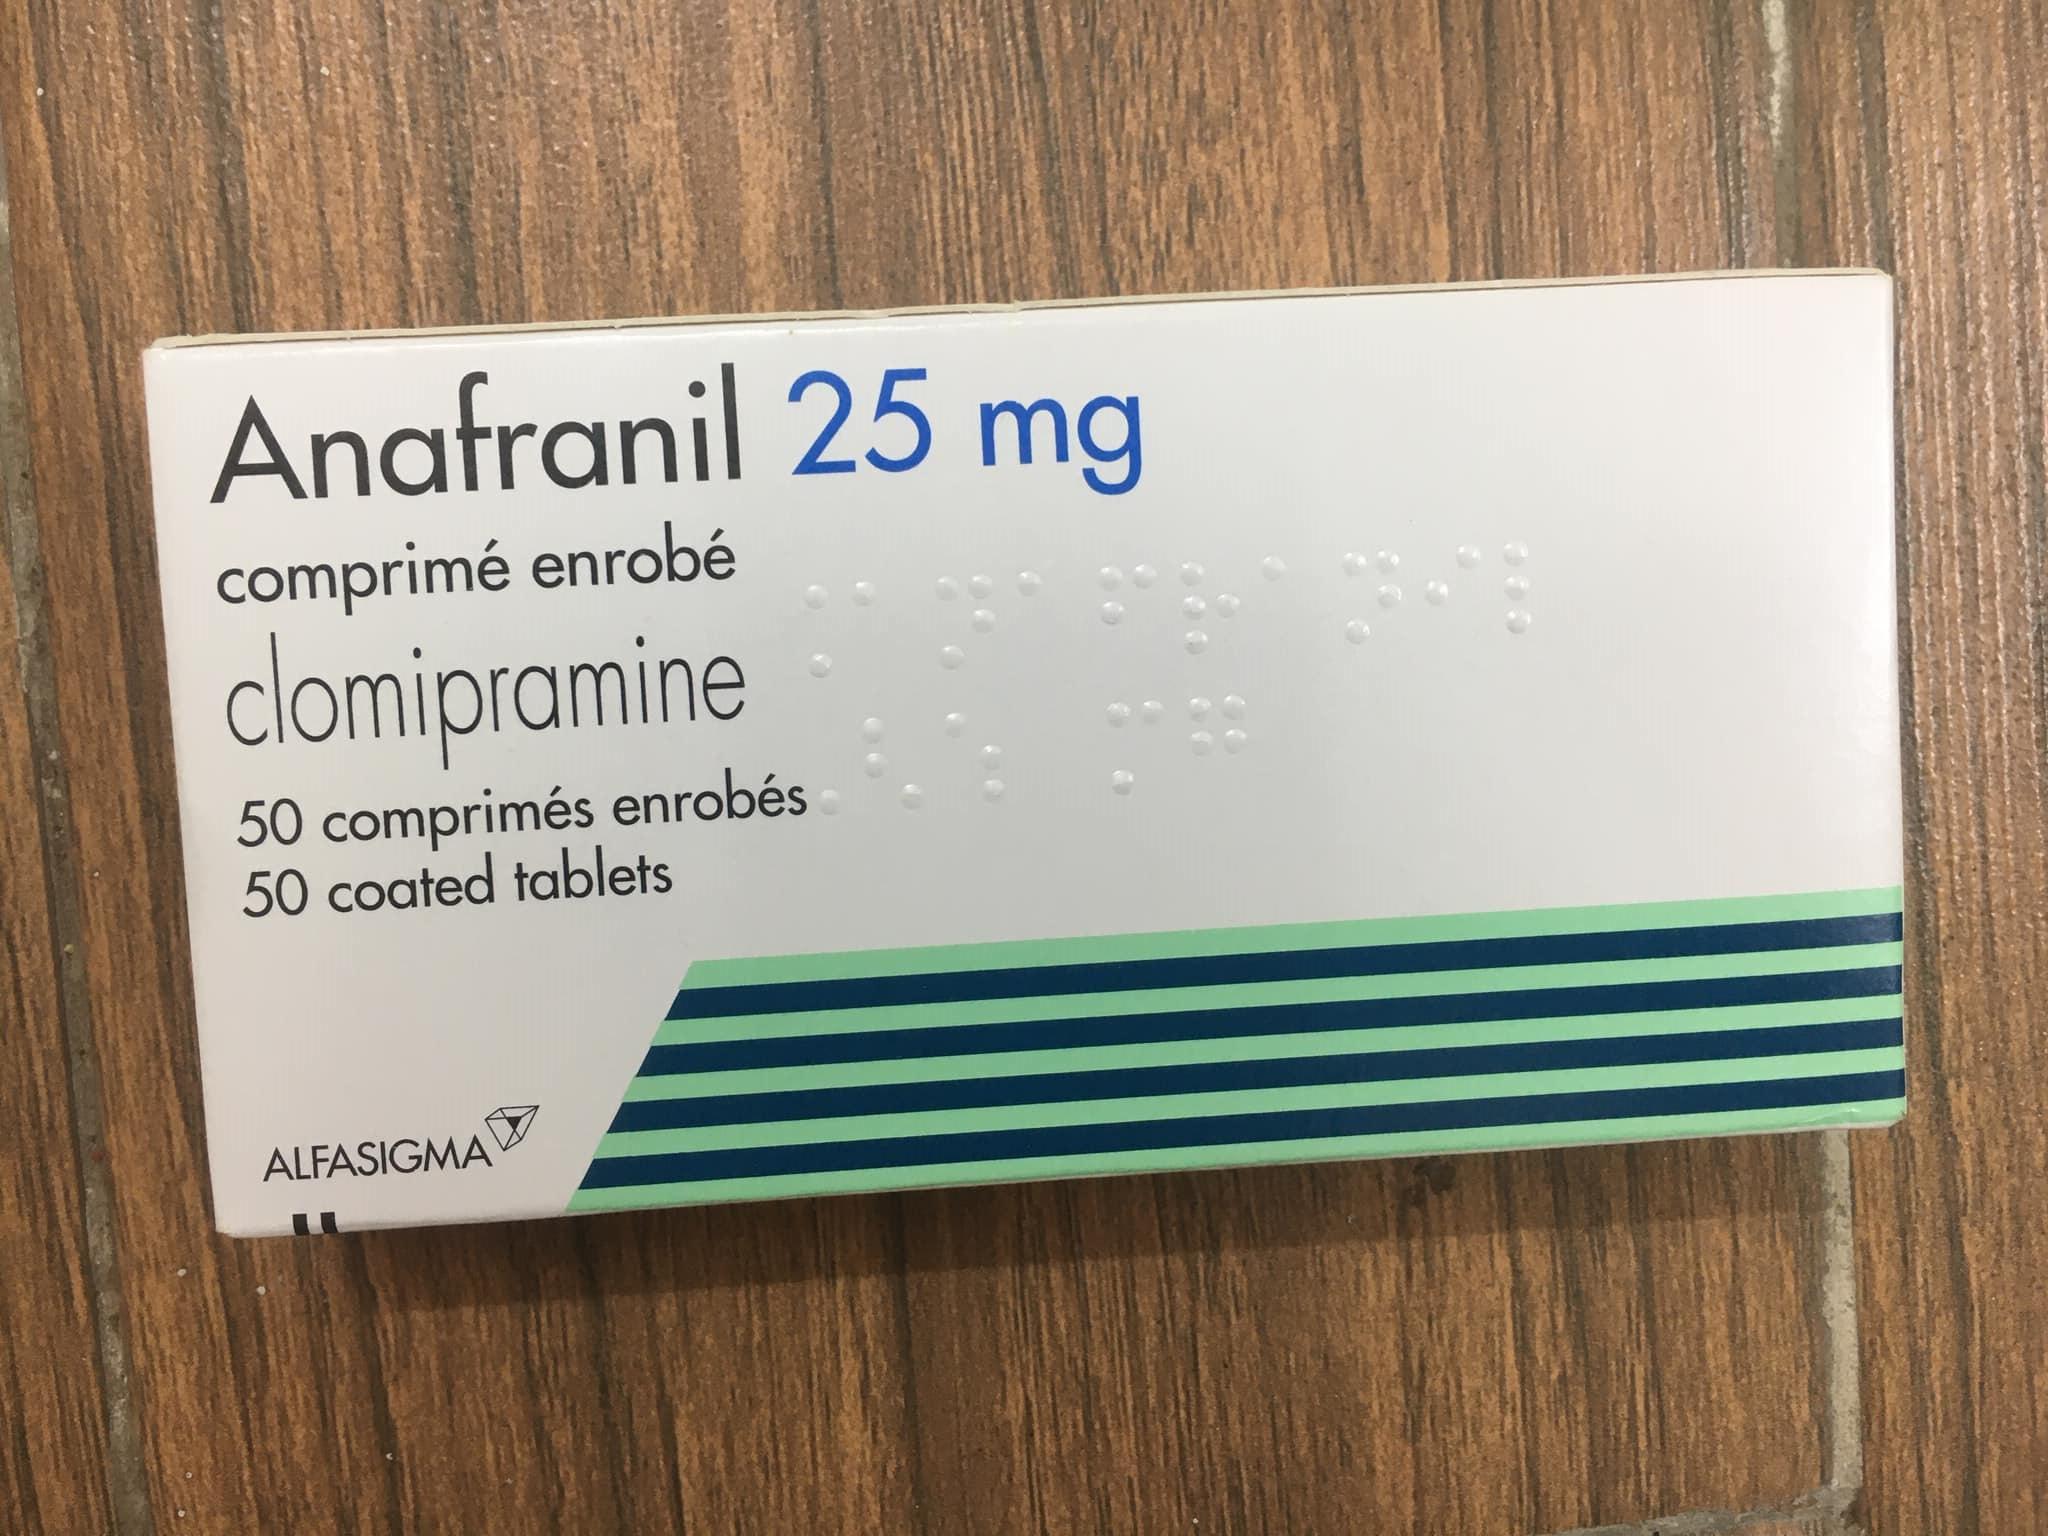 Anafranil 25mg